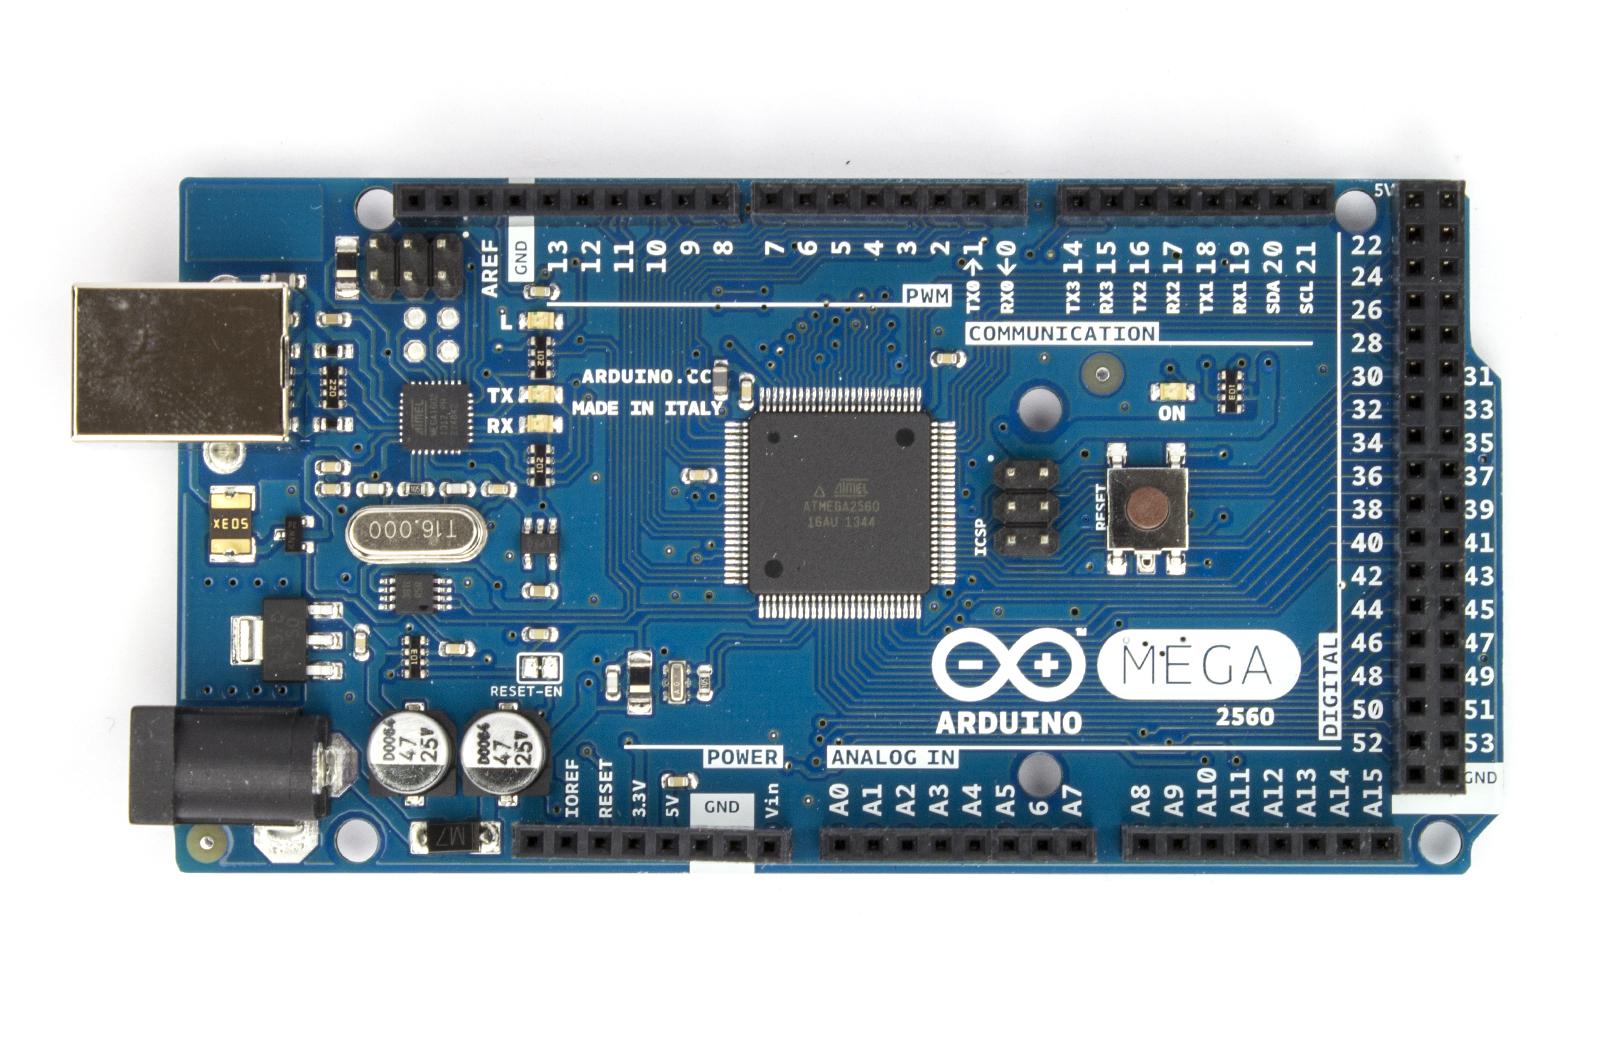 Arduino MEGA 2560 R3 จำนวน 3 ชุด (แถมสาย USB)